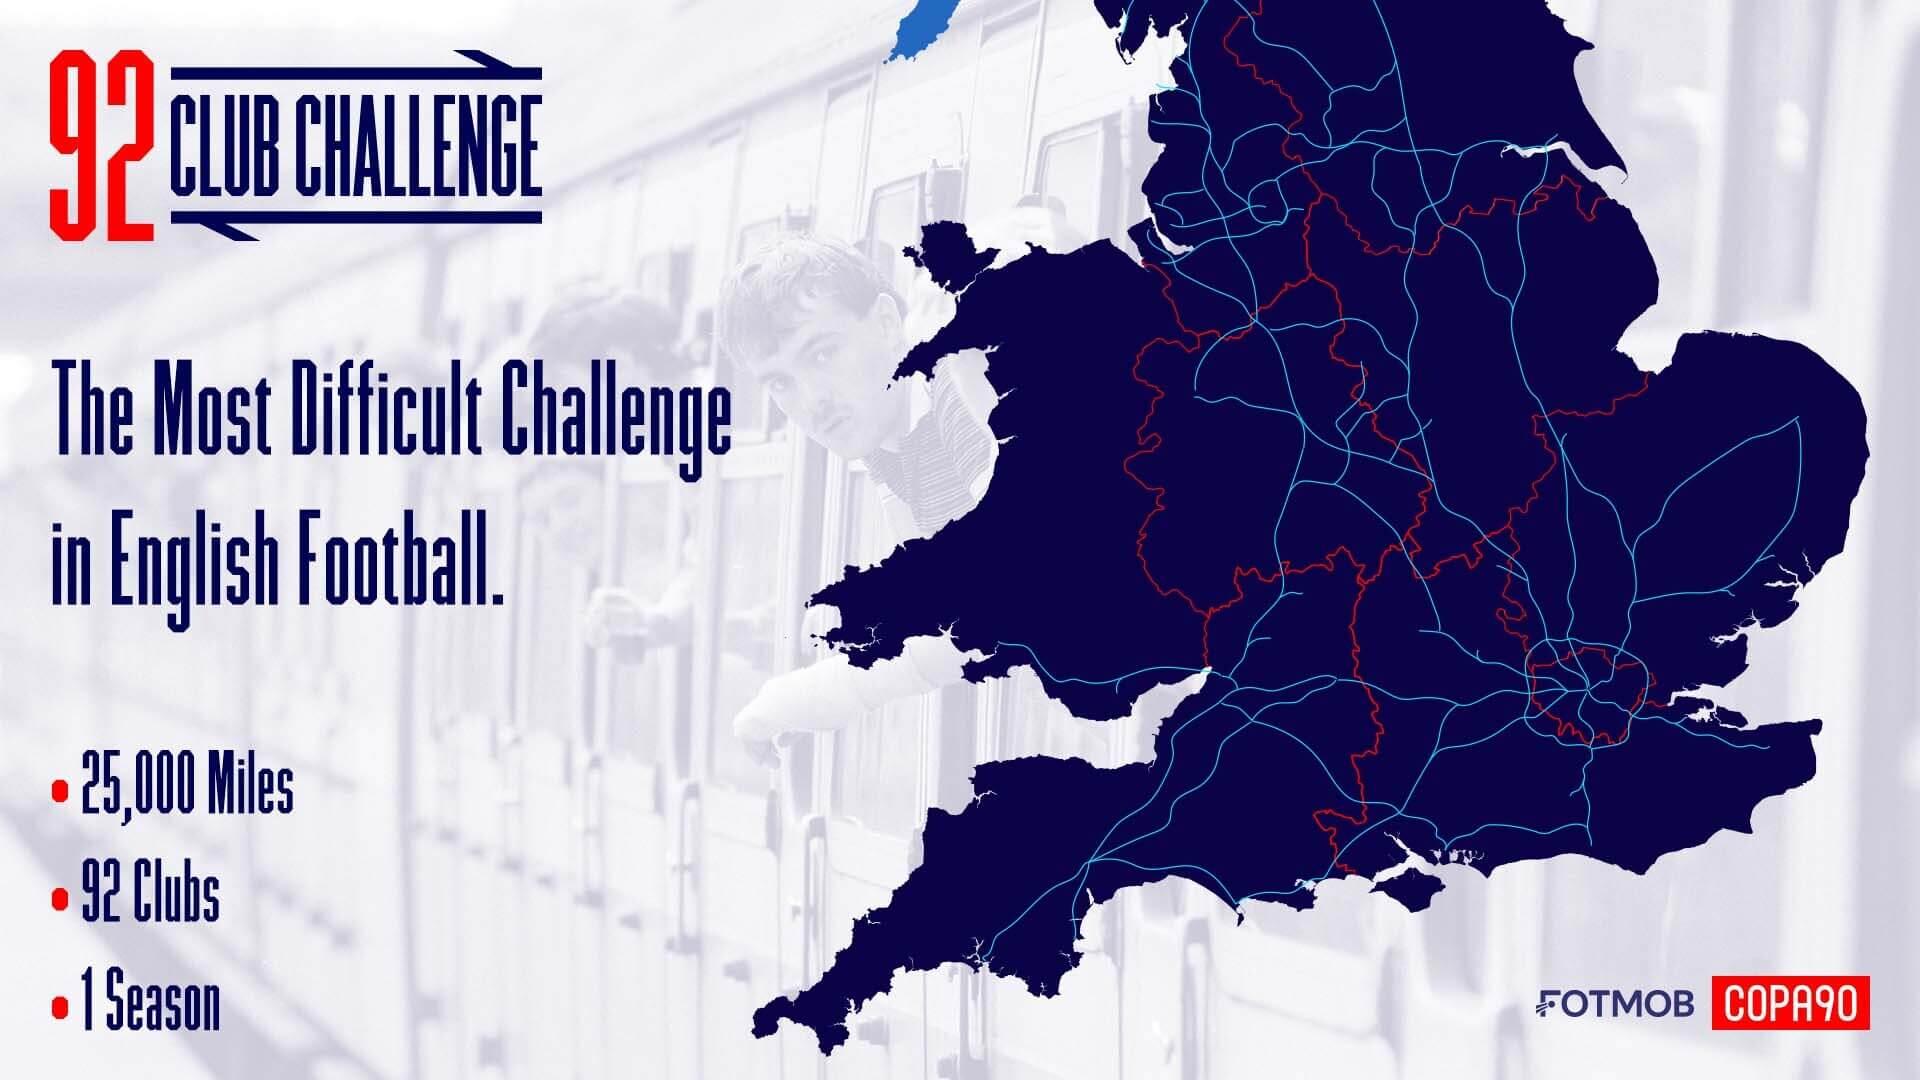 The 92 Club Challenge: Fratton Park